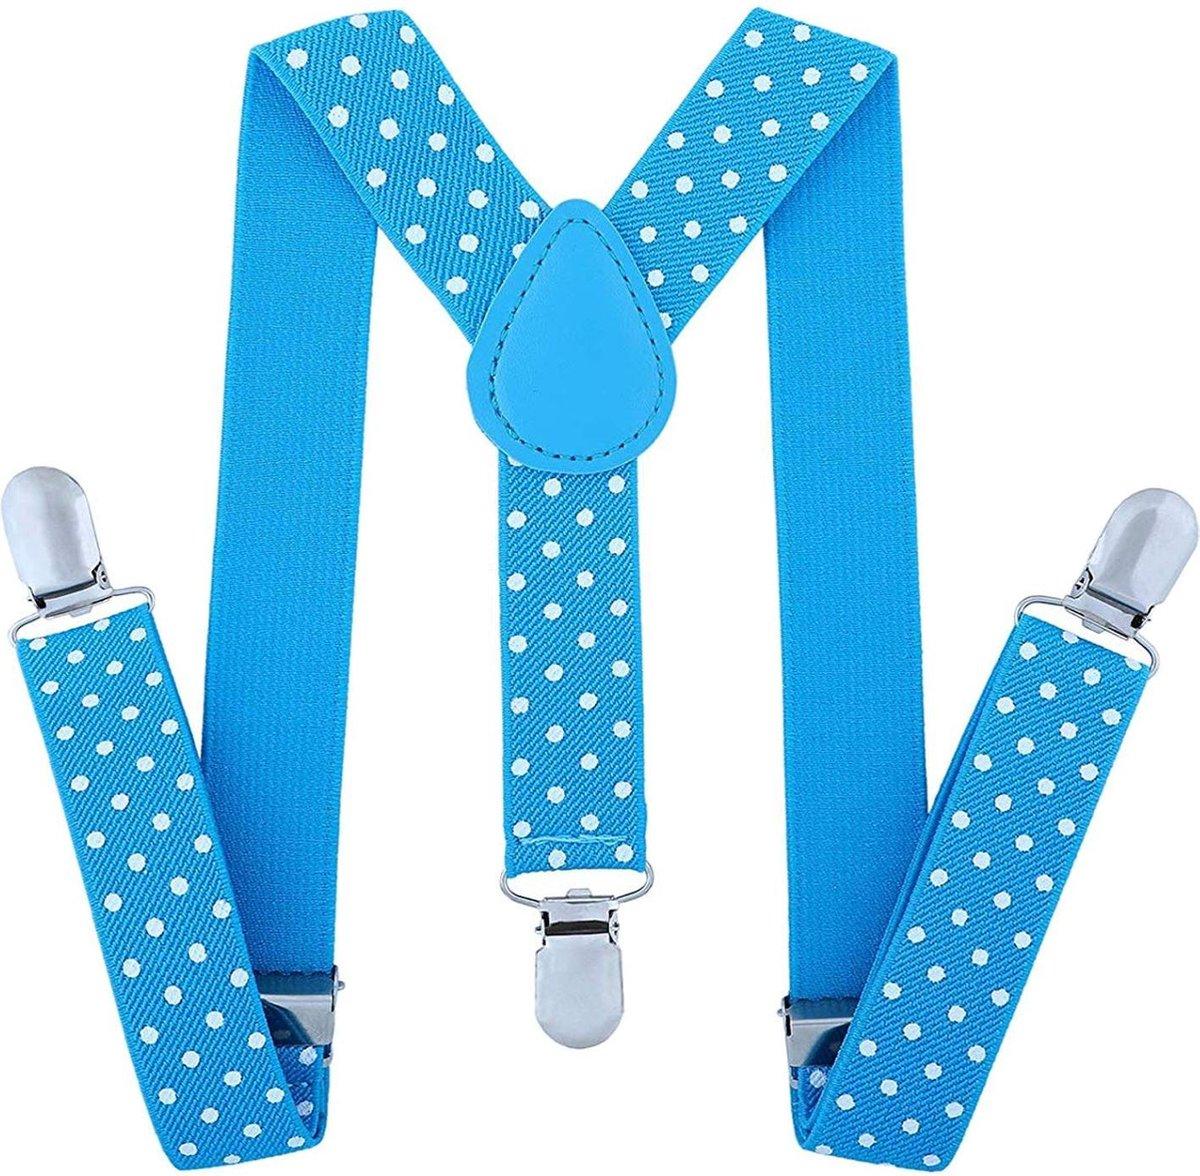 Fako Fashion® - Kinder Bretels - Stippen - 65cm - Lichtblauw